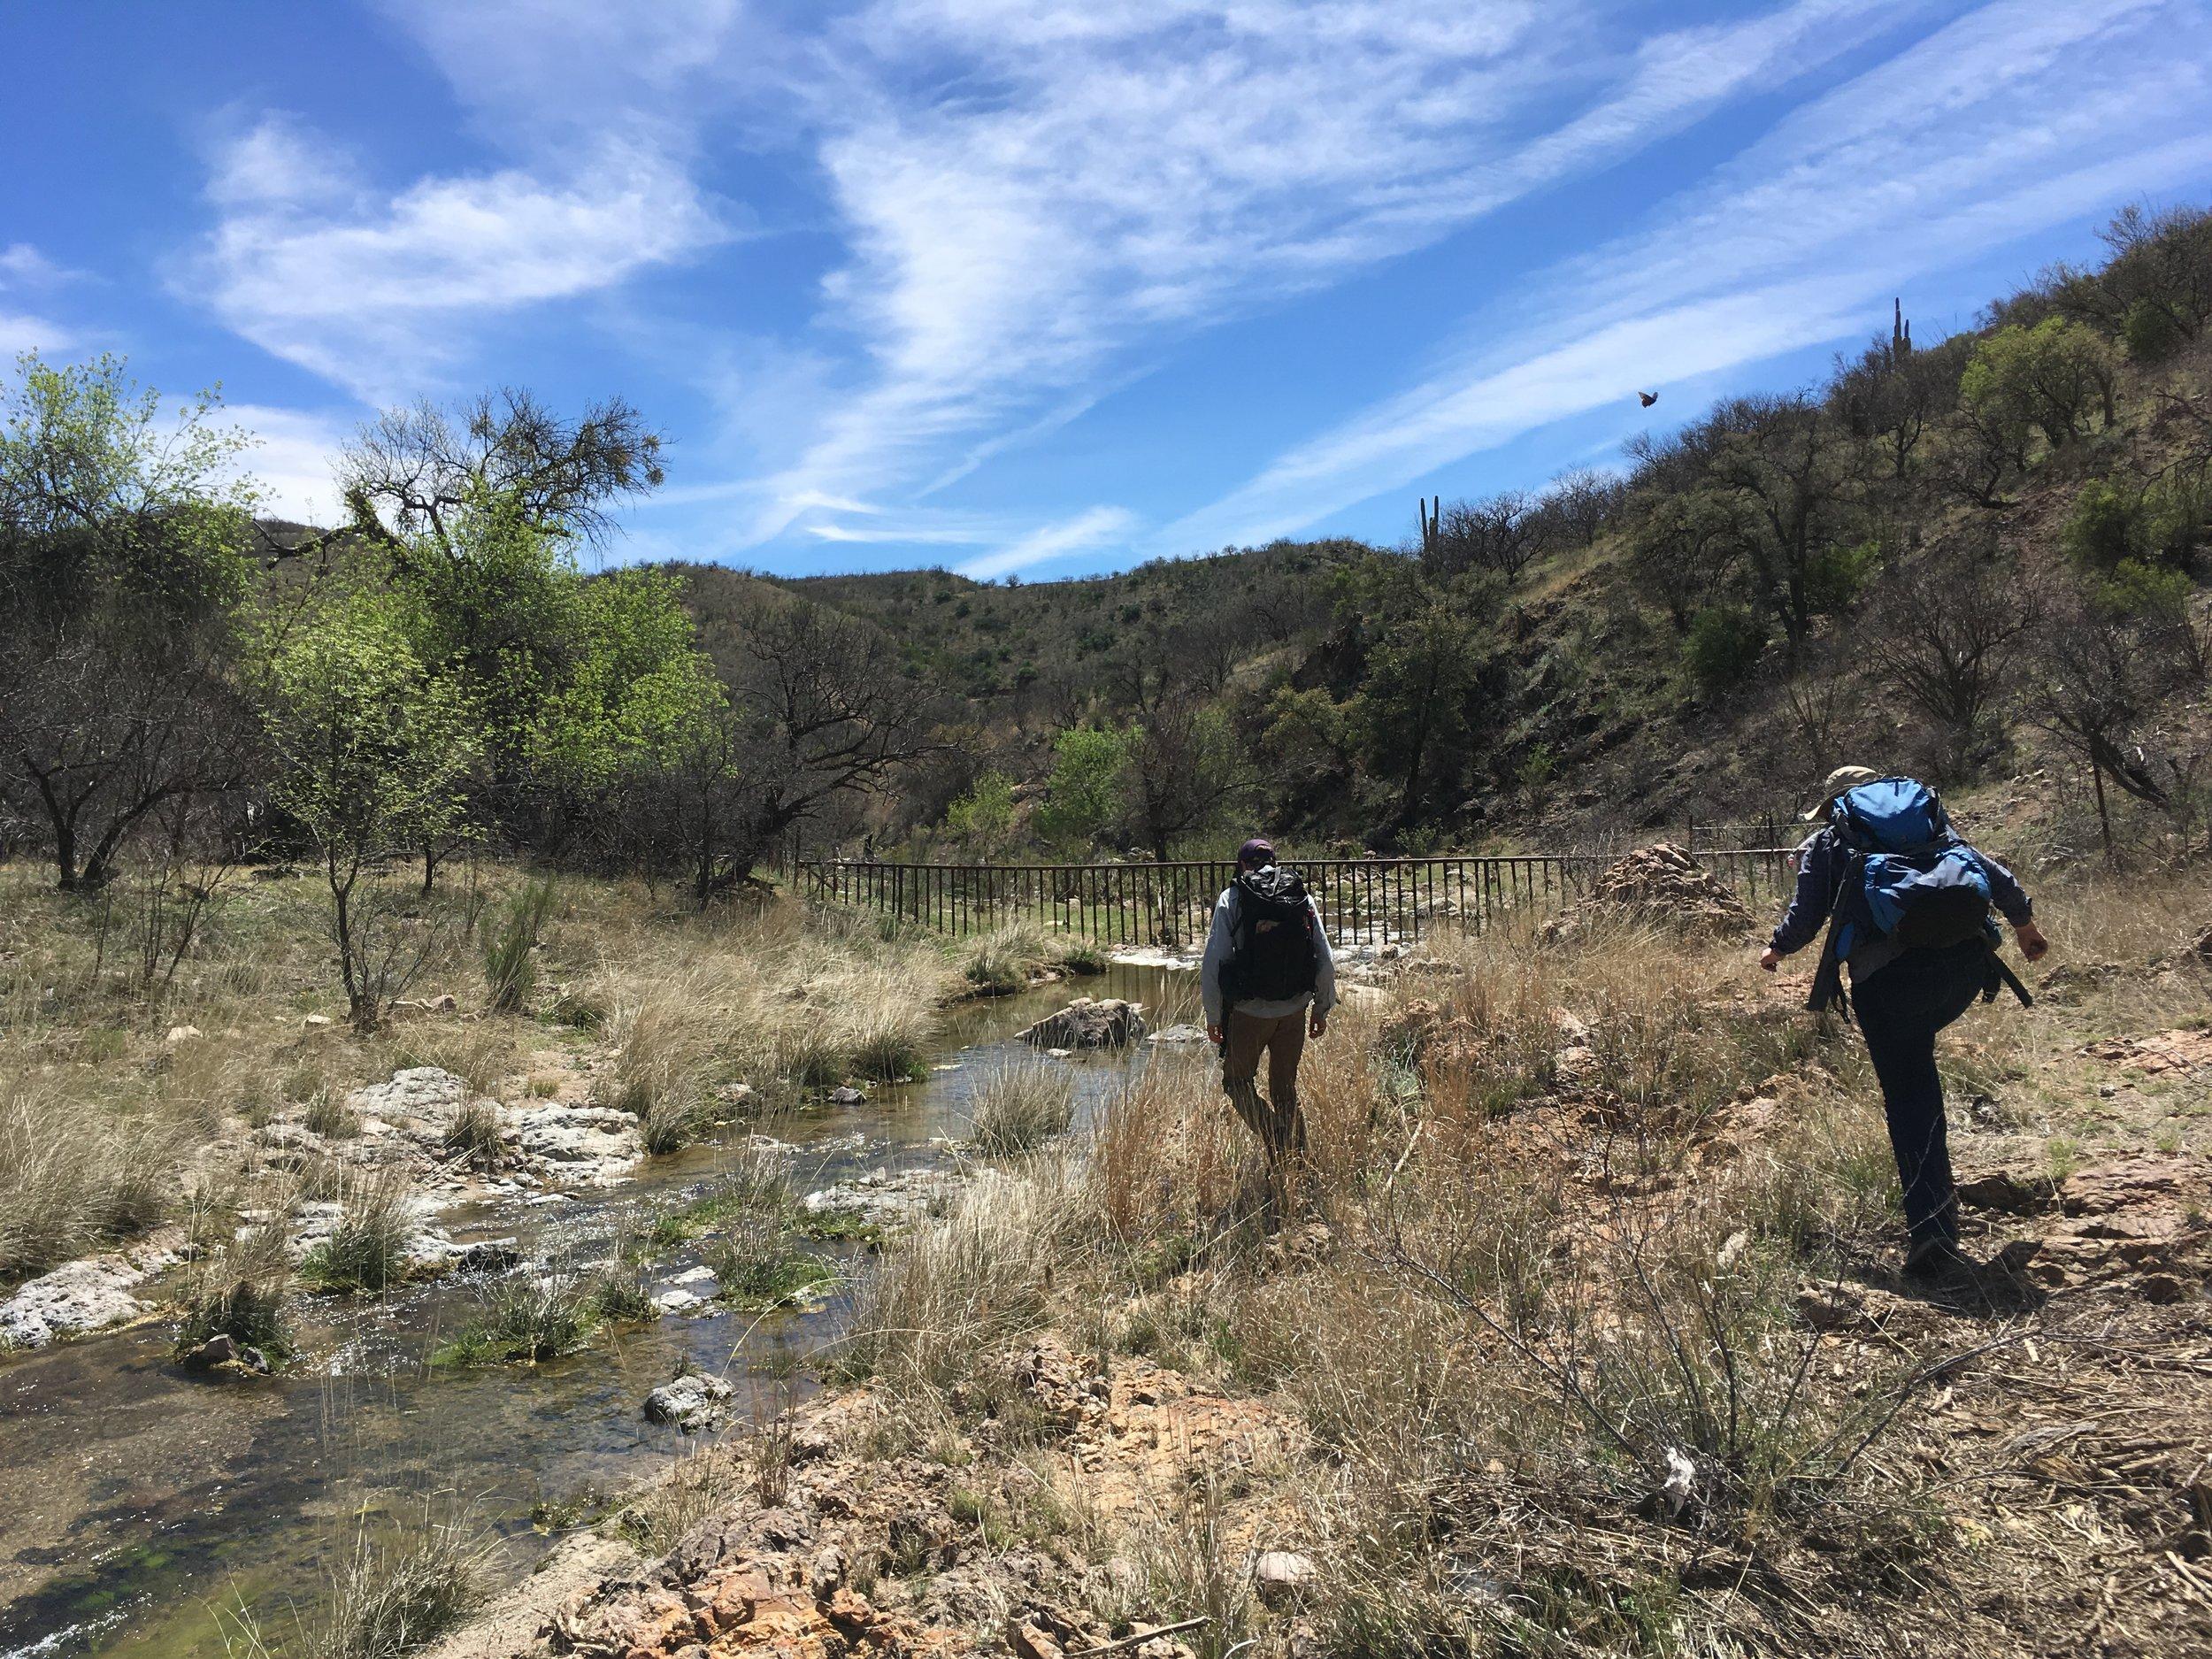 Walking near the border's vehicle barrier